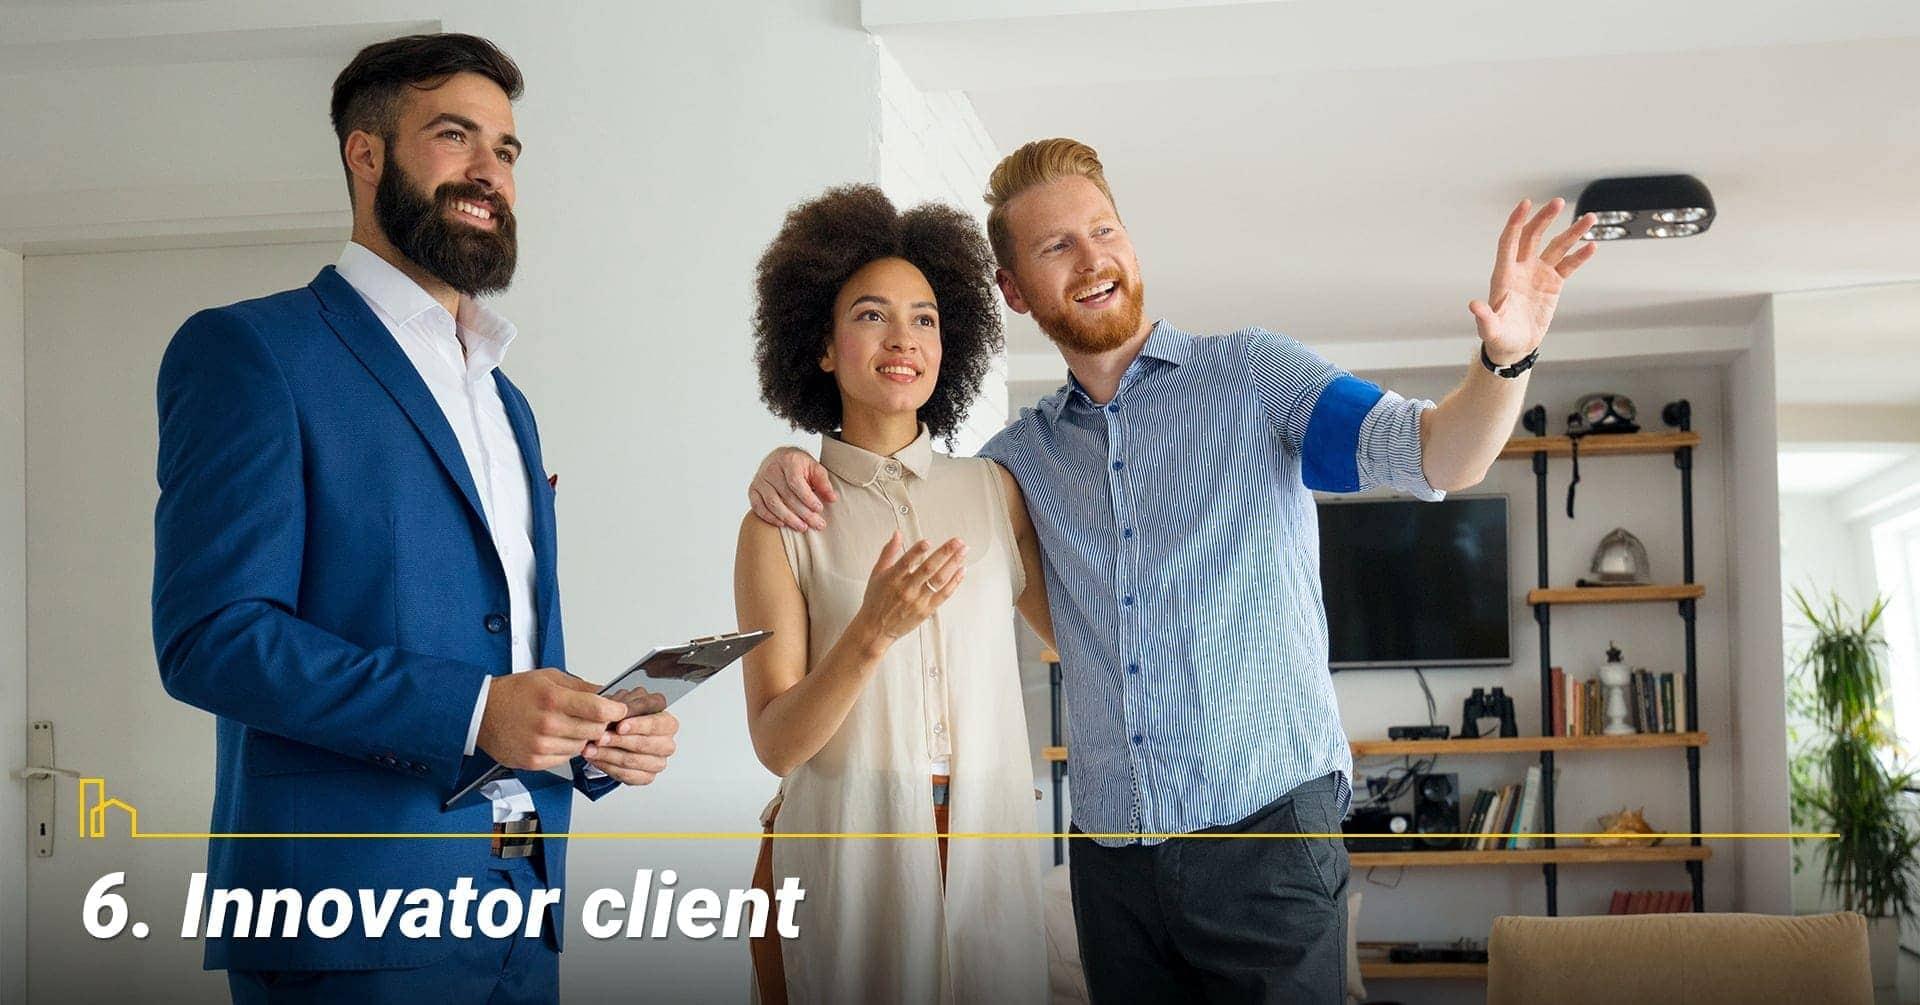 Innovator client